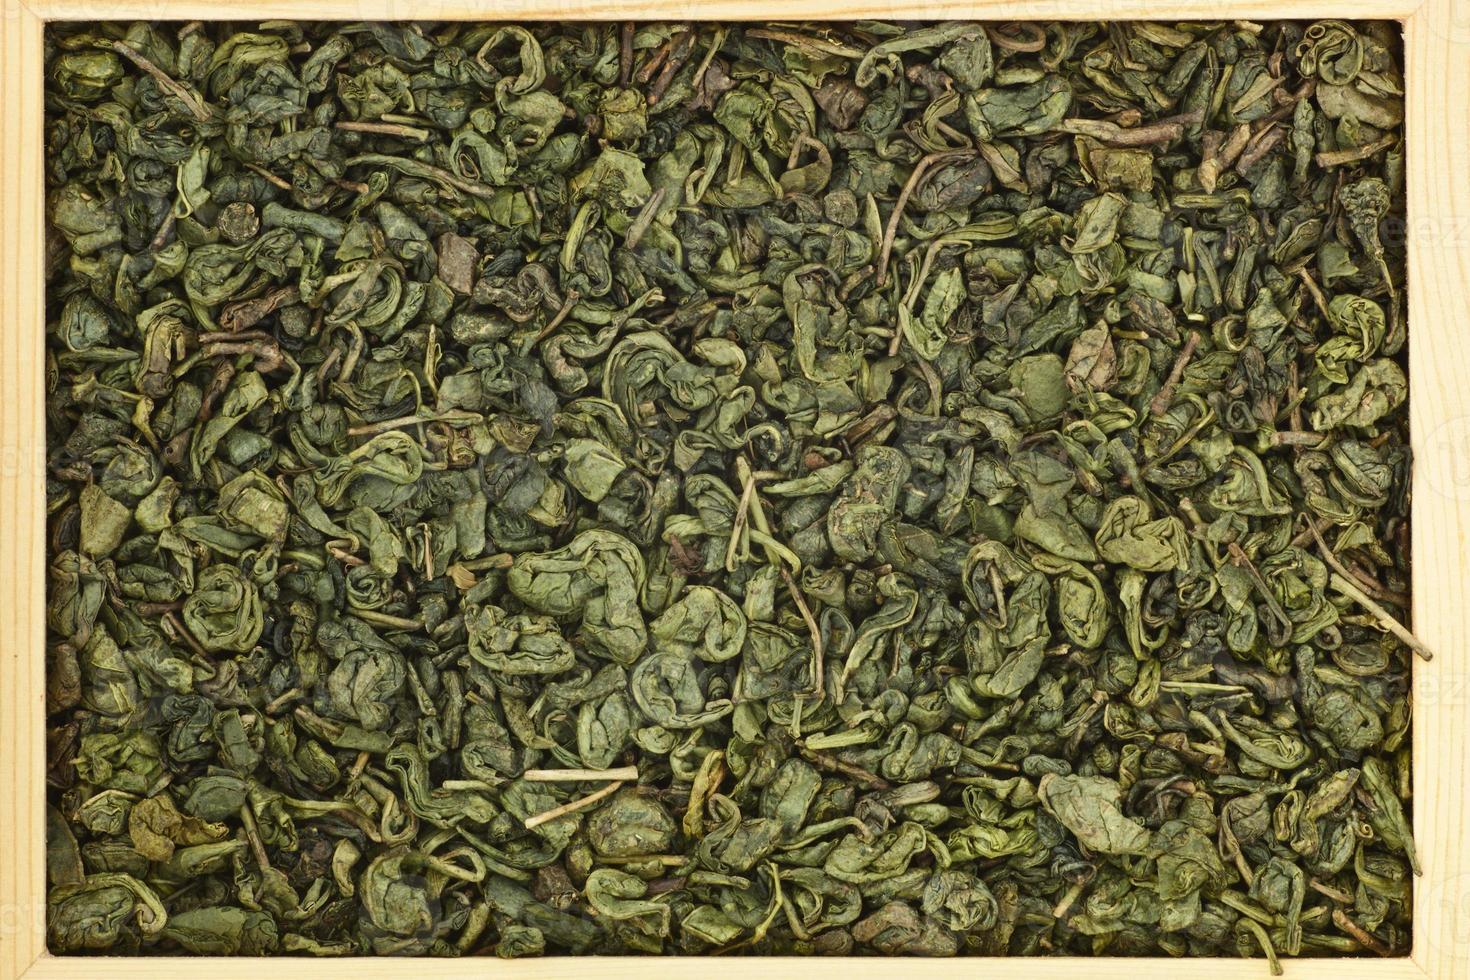 tè verde cinese foto